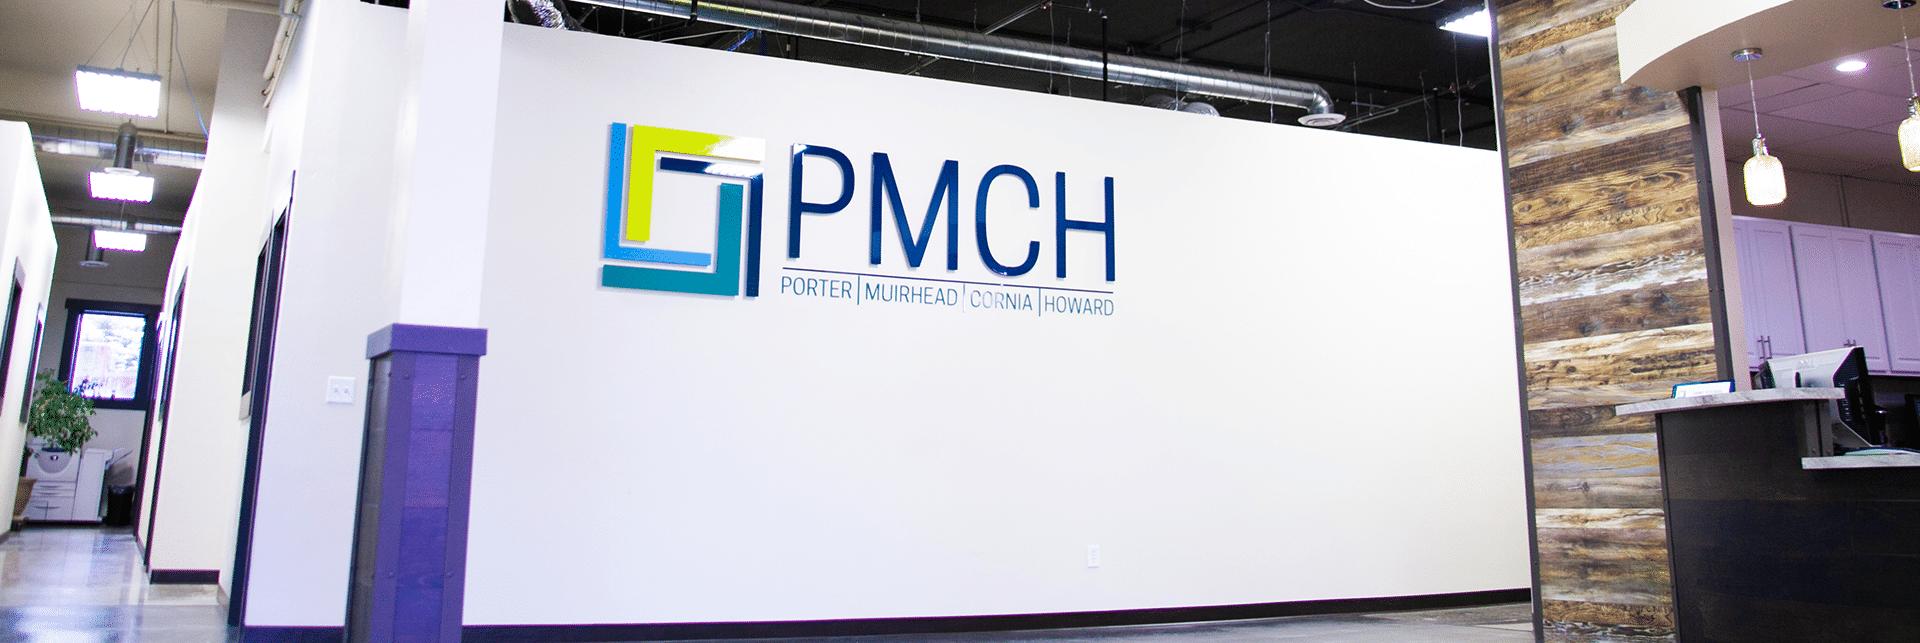 PMCH Hero